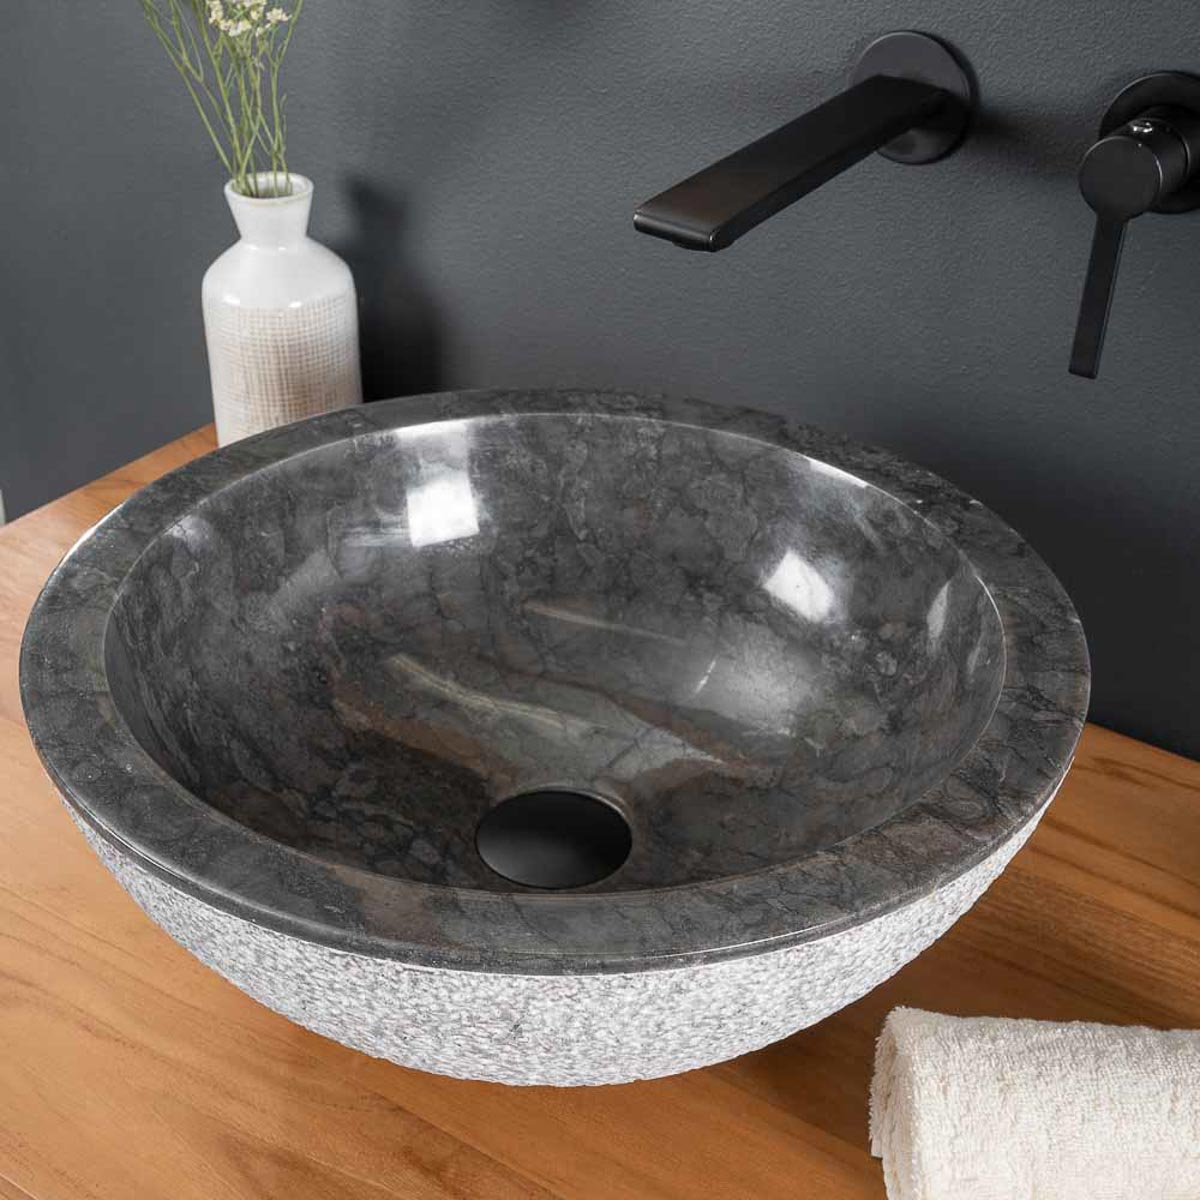 vasque poser en marbre stromboli ronde noire d 40 cm. Black Bedroom Furniture Sets. Home Design Ideas